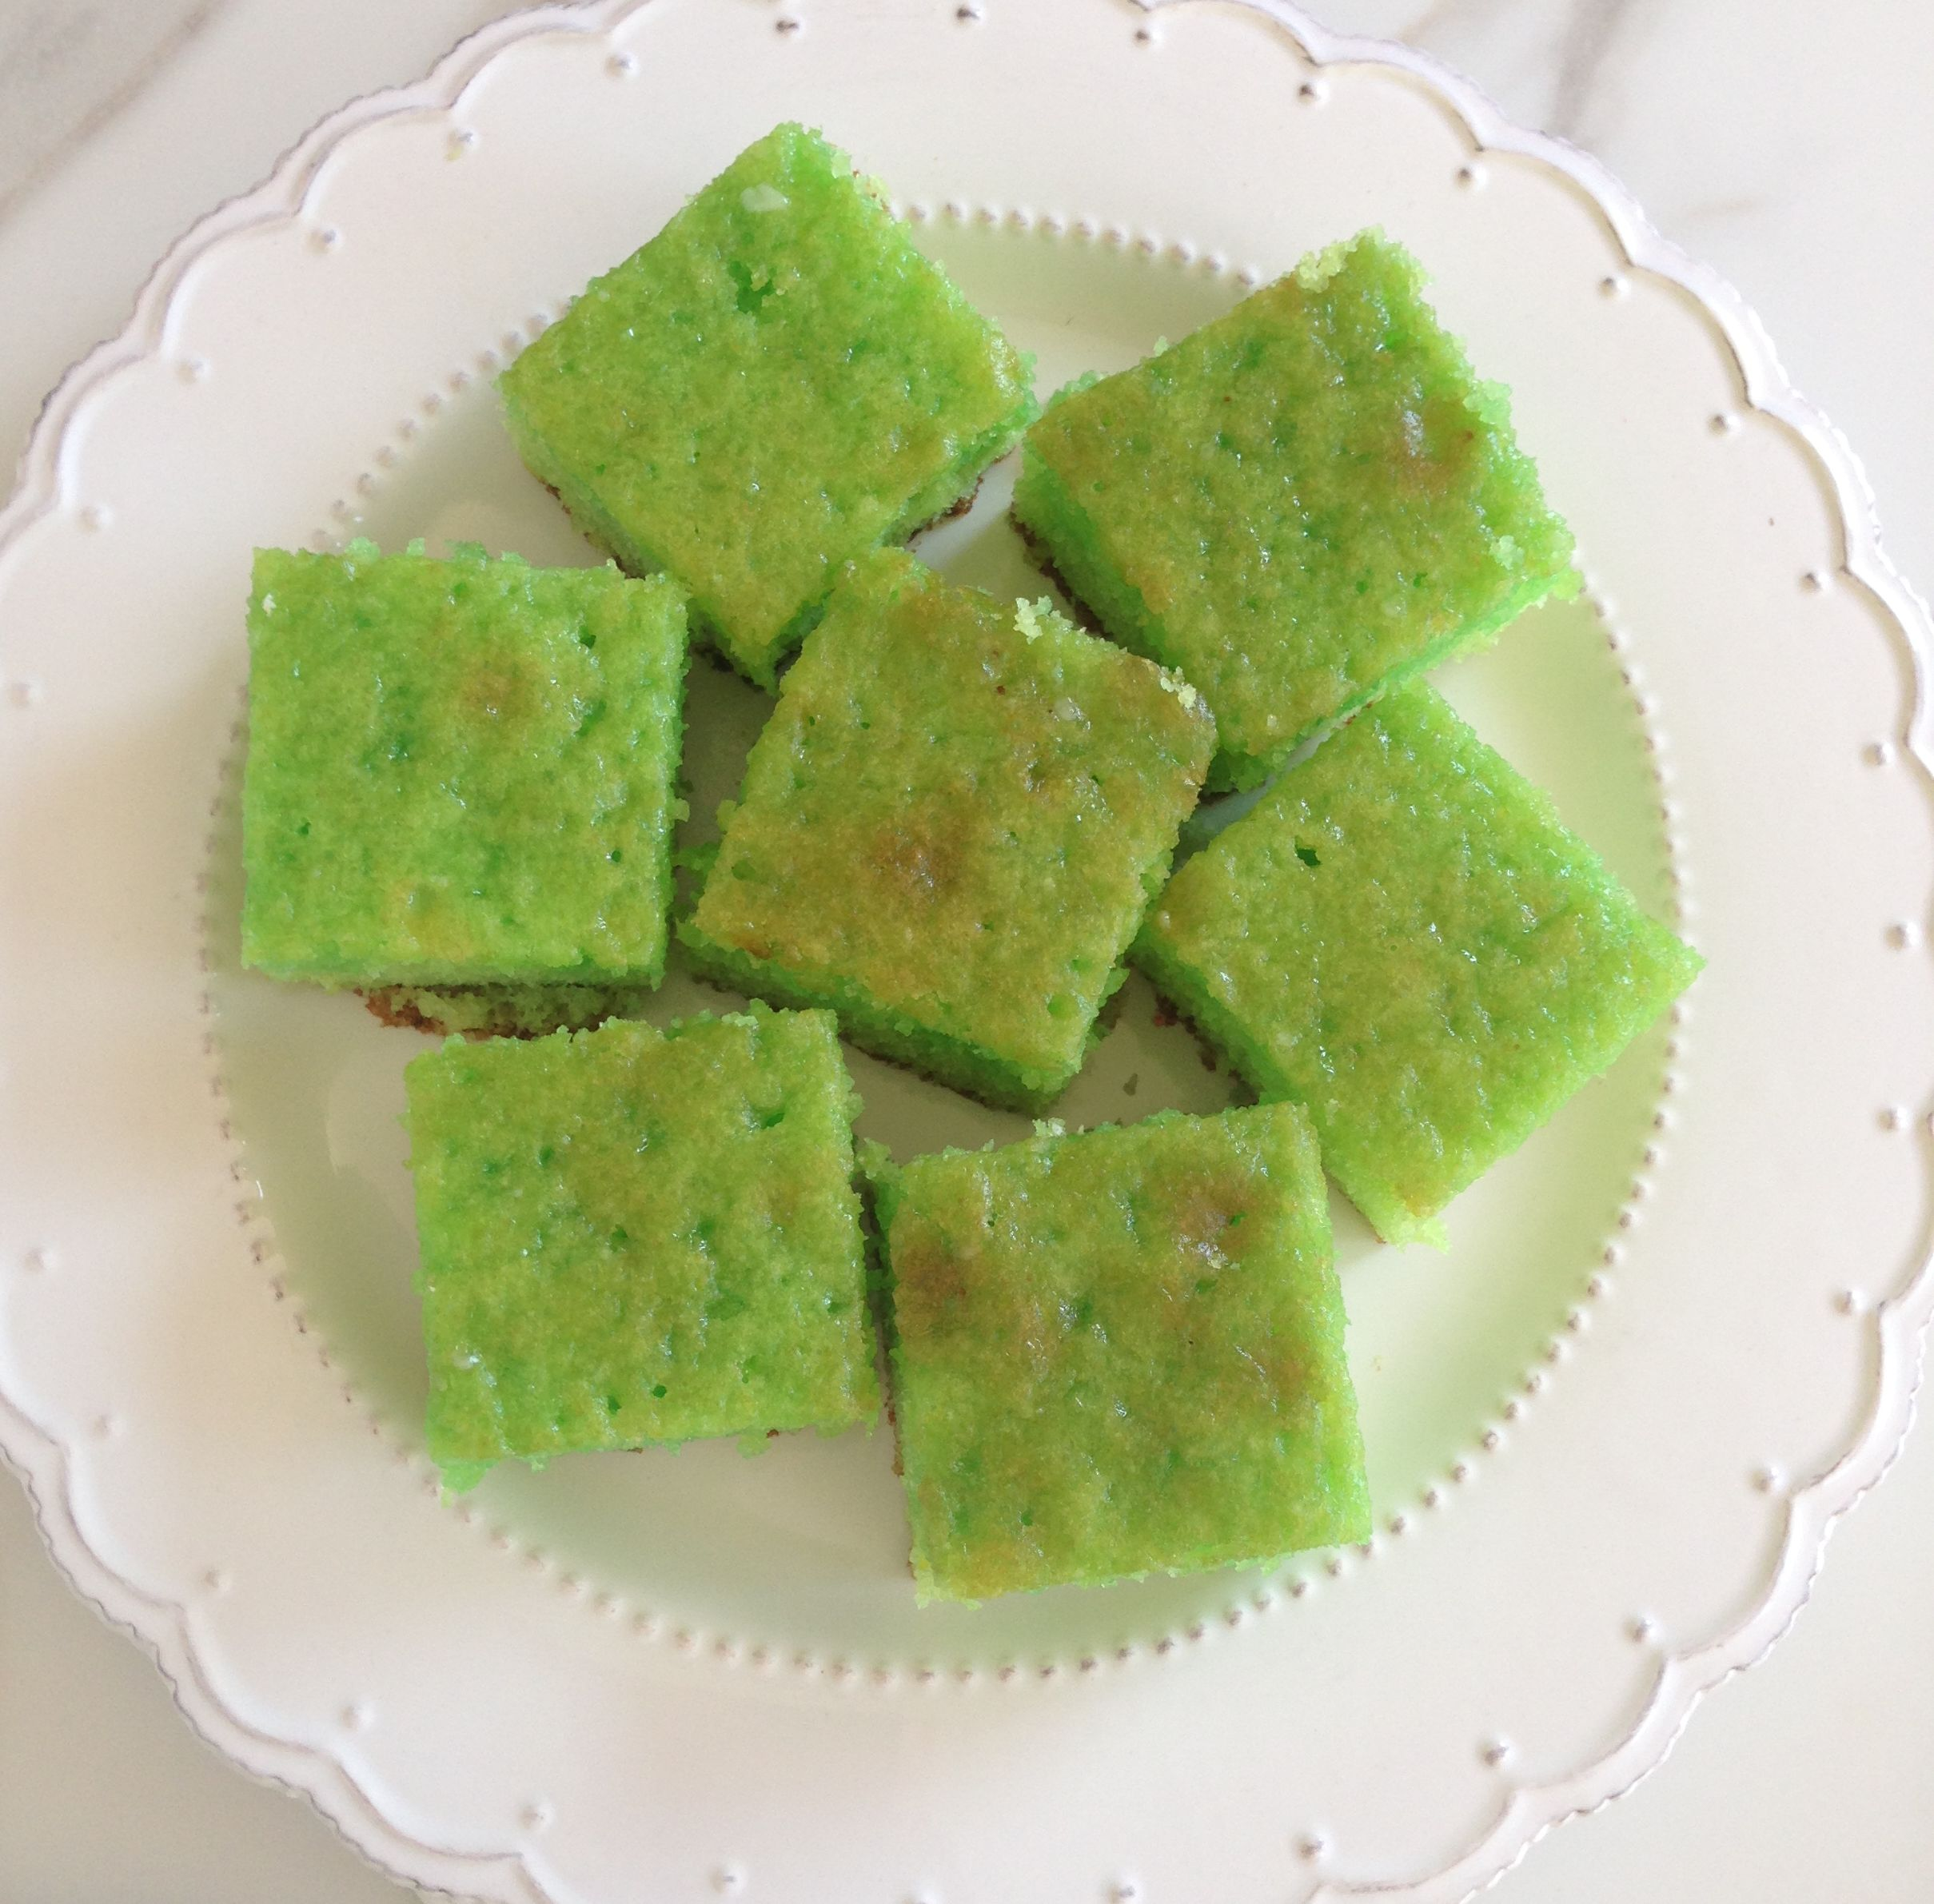 Key Lime Cake with Limeade Glaze Recipe – Happy St. Patty's Day!